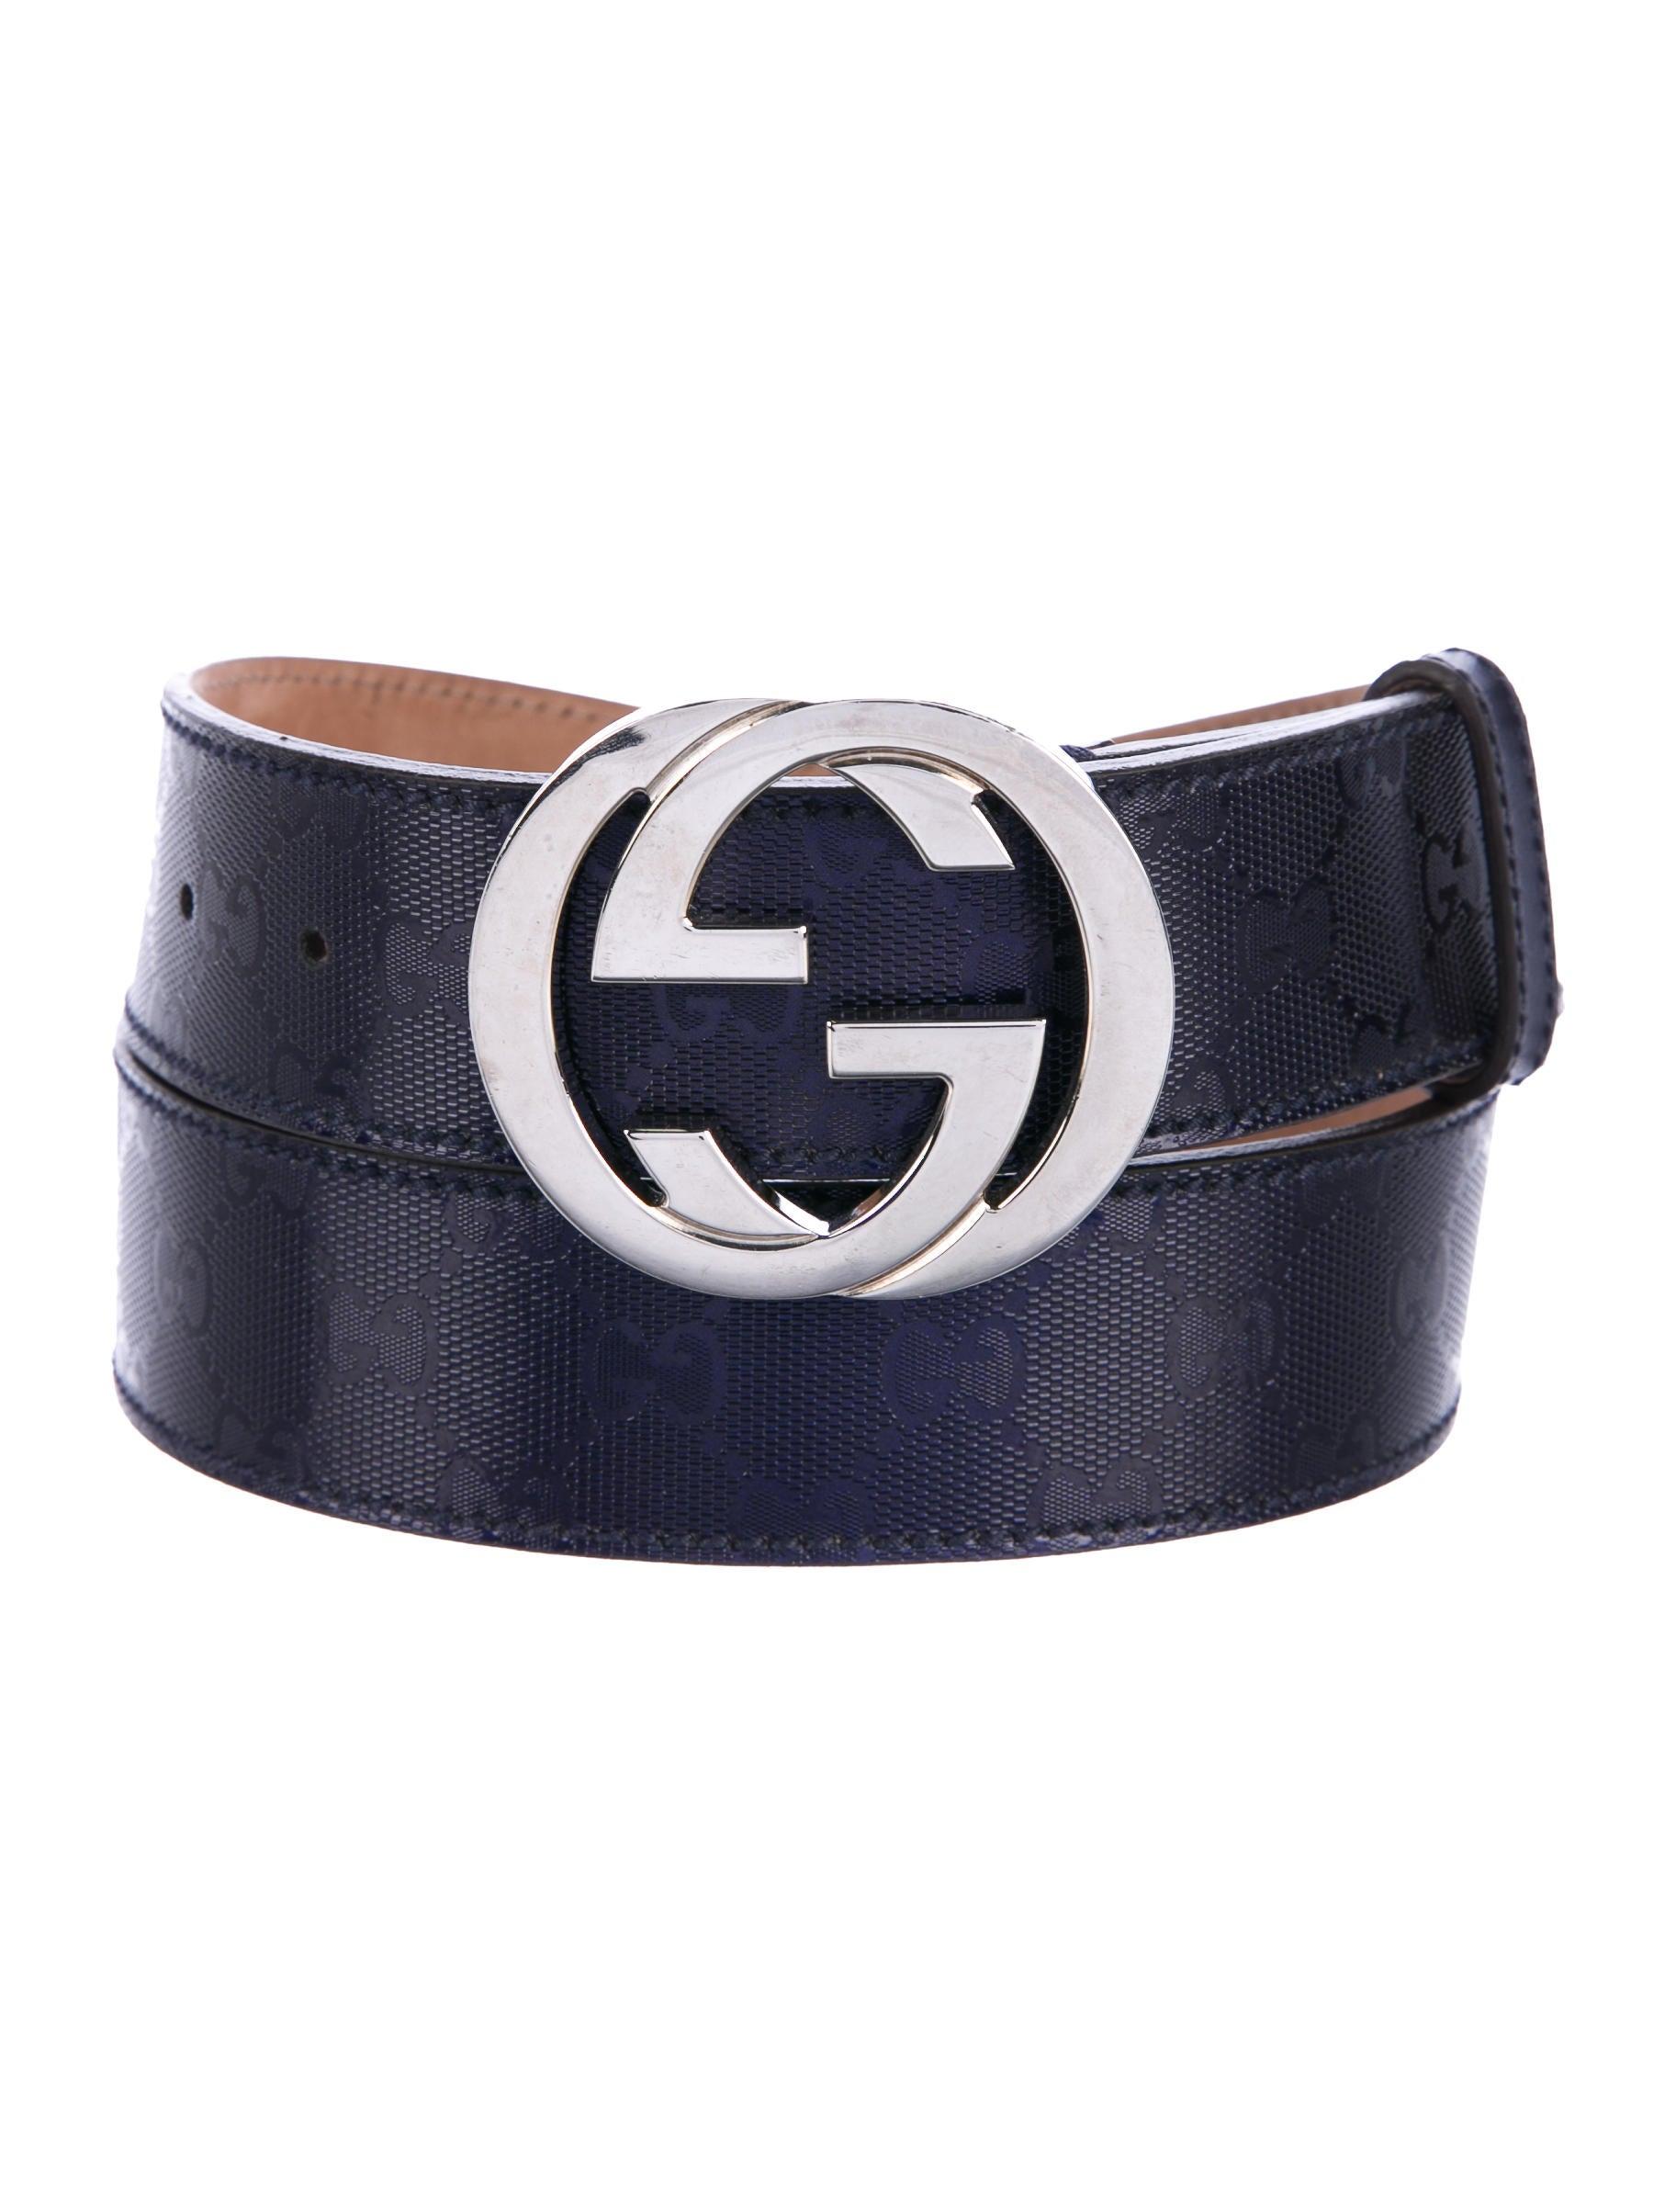 d1c3553e2b3 Gucci GG Imprimé Belt - Accessories - GUC184532